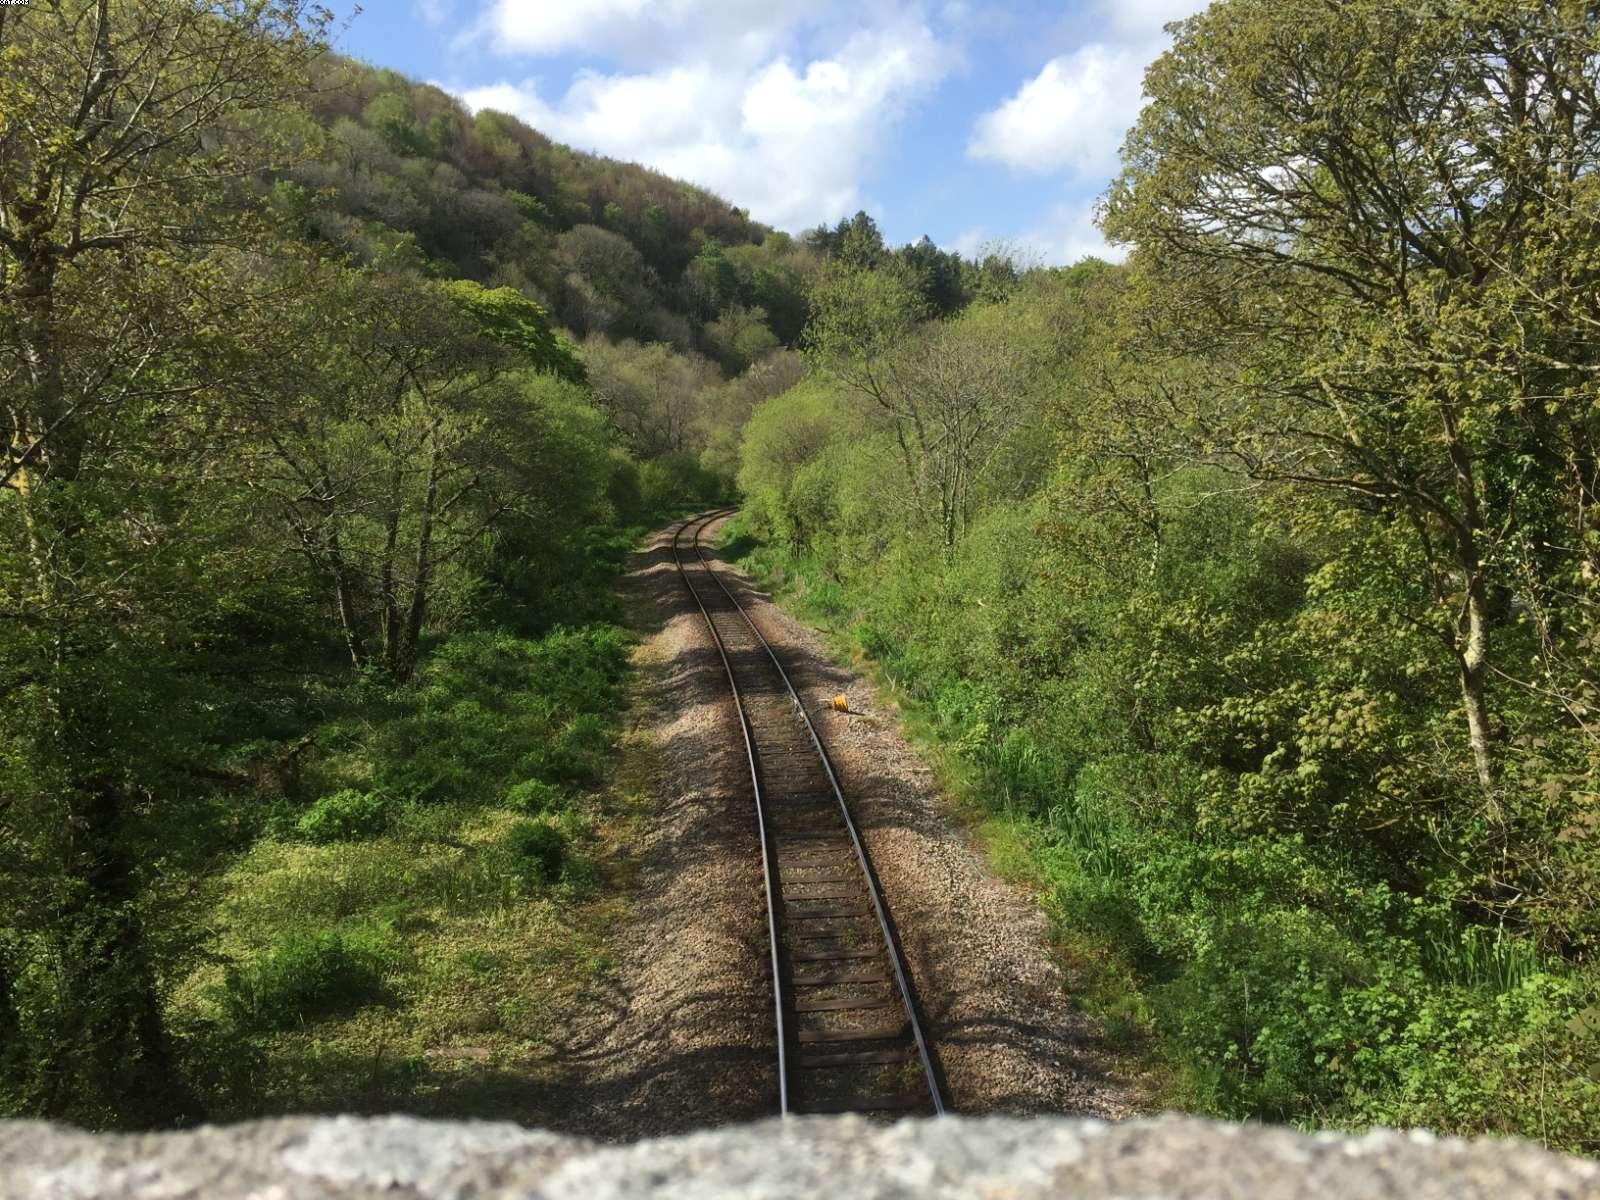 Single track Railway in Looe Valley from Sandplace Bridge